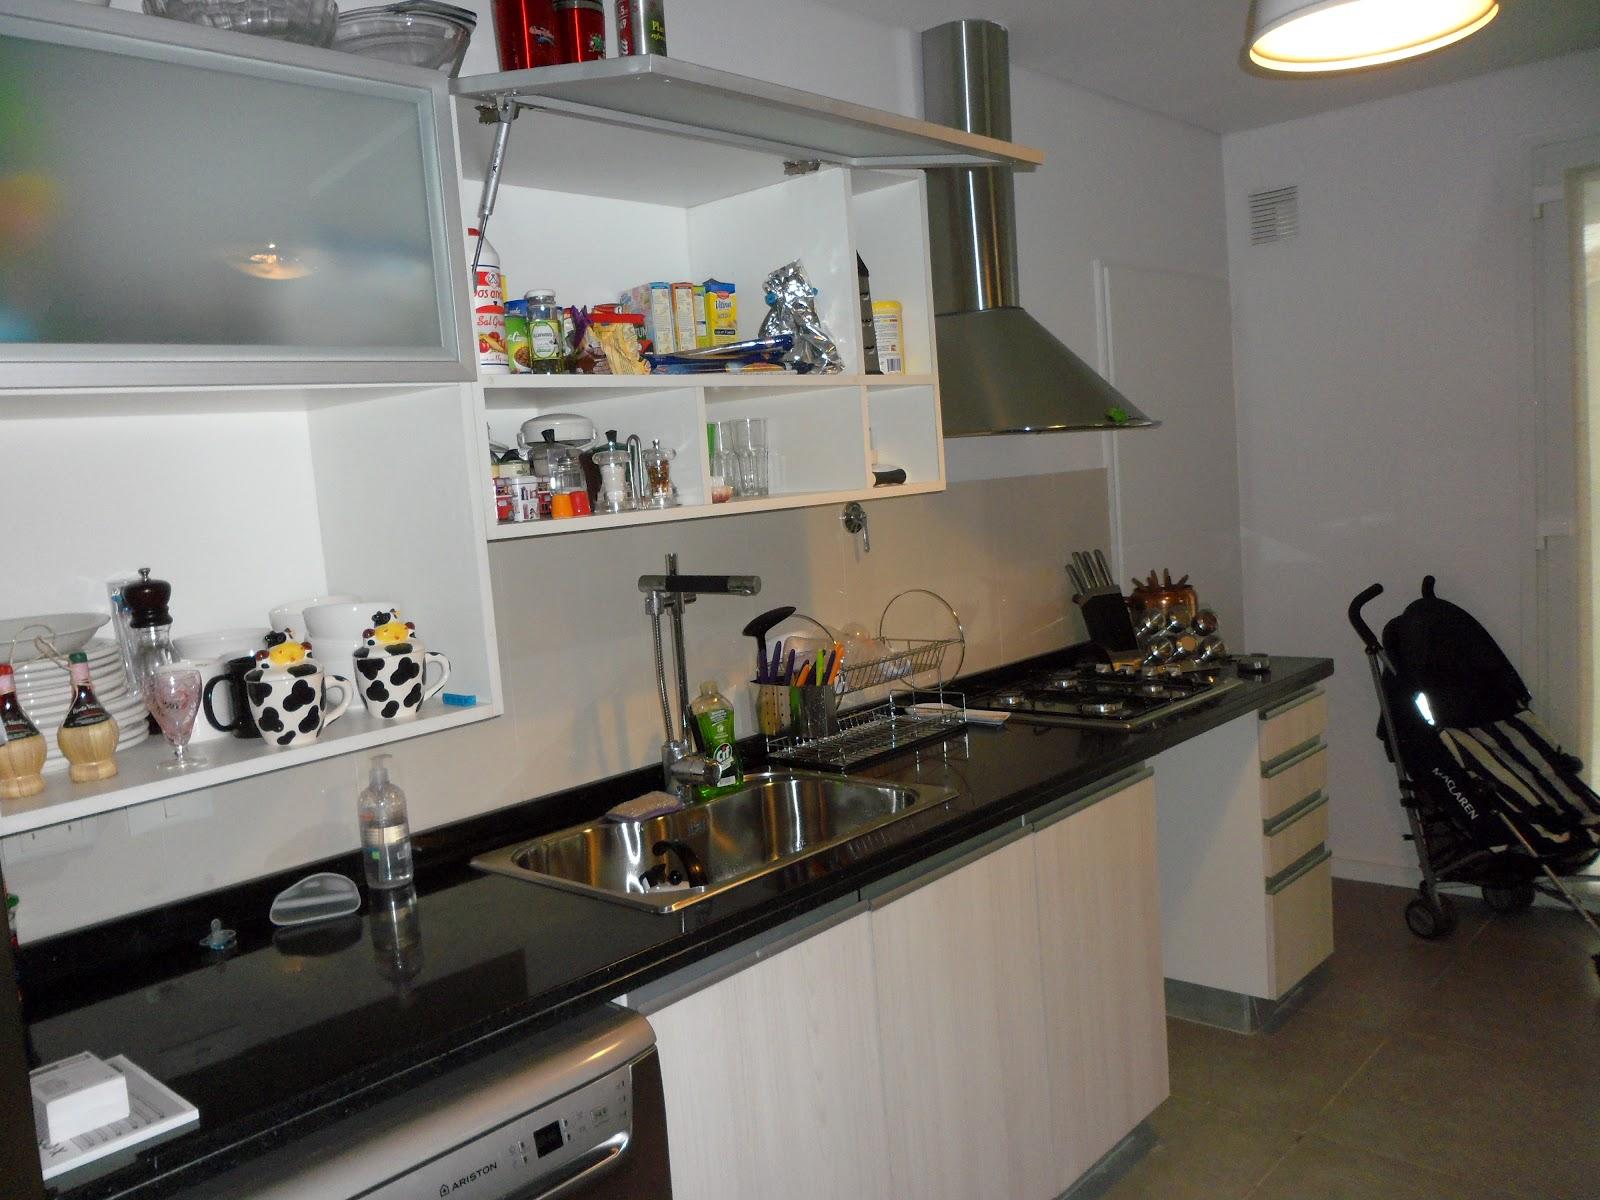 Cocina en teka artico sandra sturm interiores - Cocina encimera teka 4 platos ...